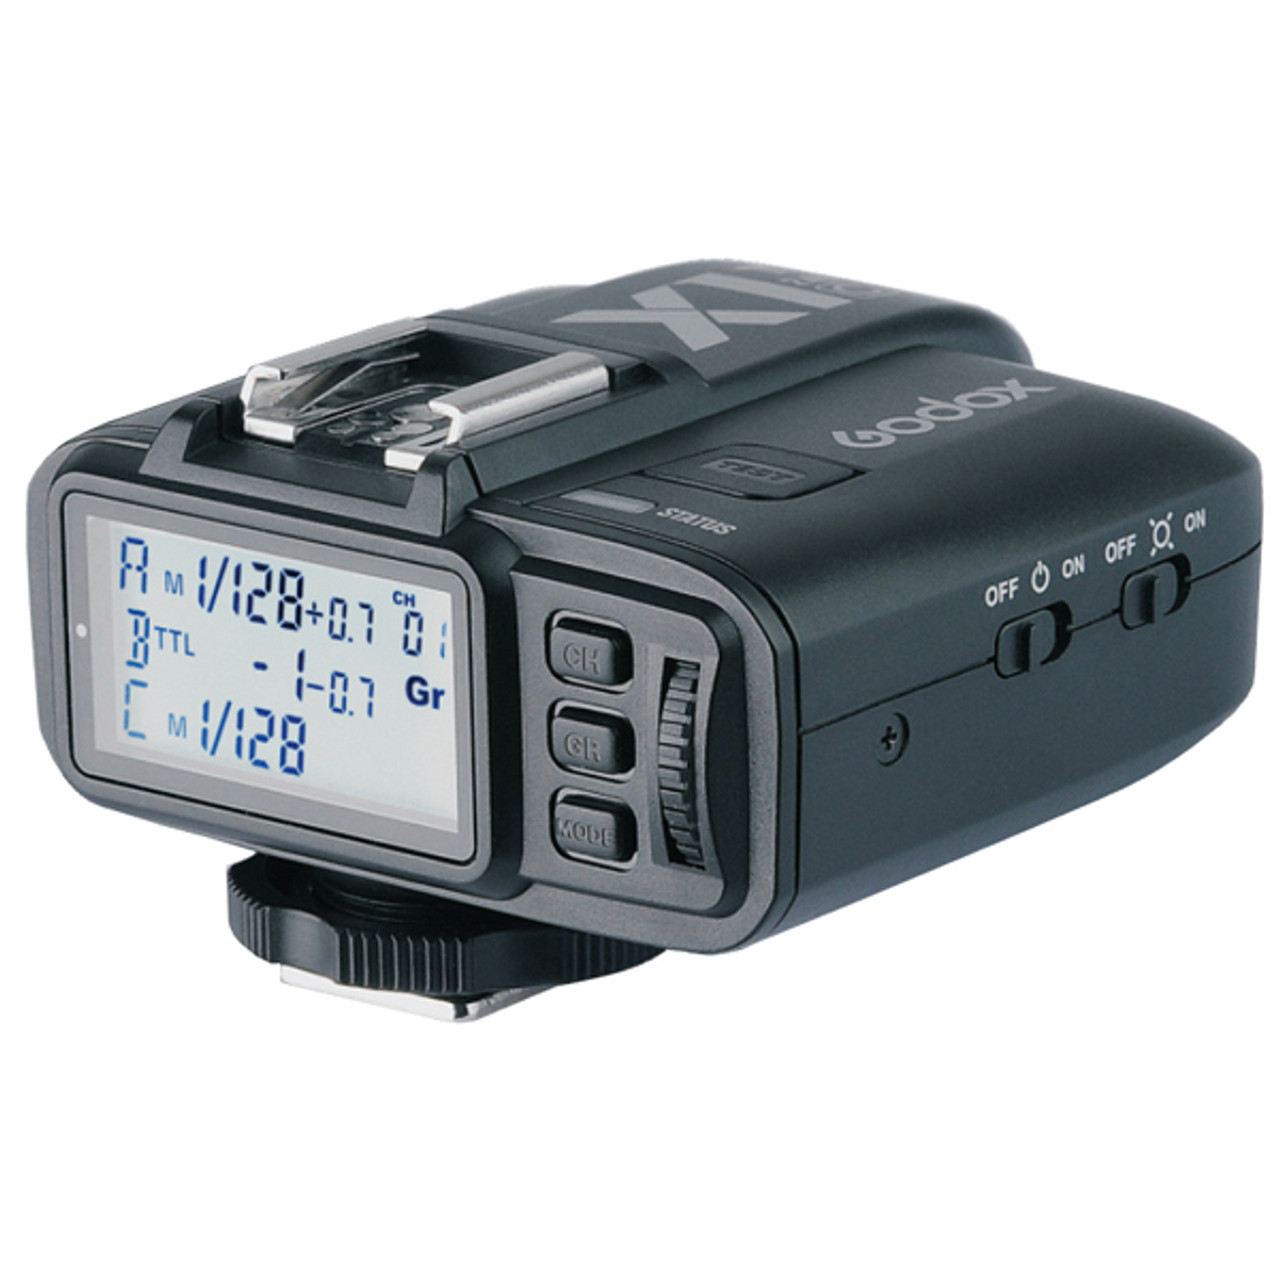 Godox X1T-C 2.4G Transmitter for Canon